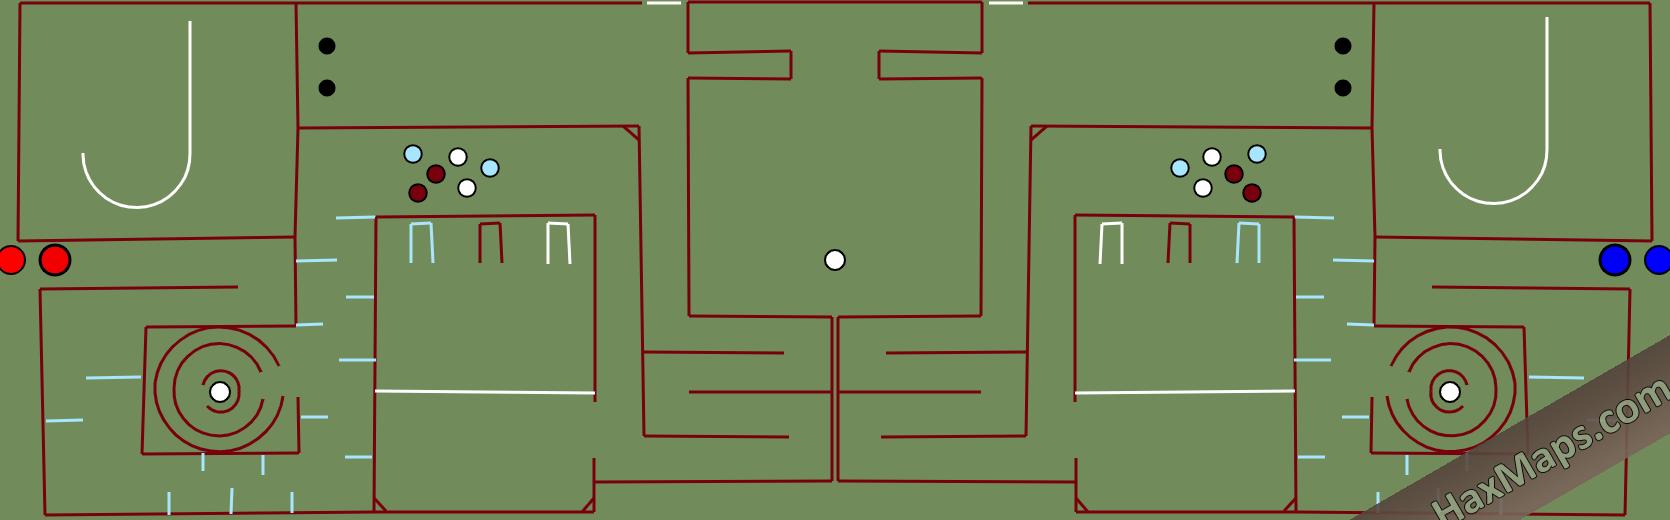 hax ball maps | Aleksey Survivor 21